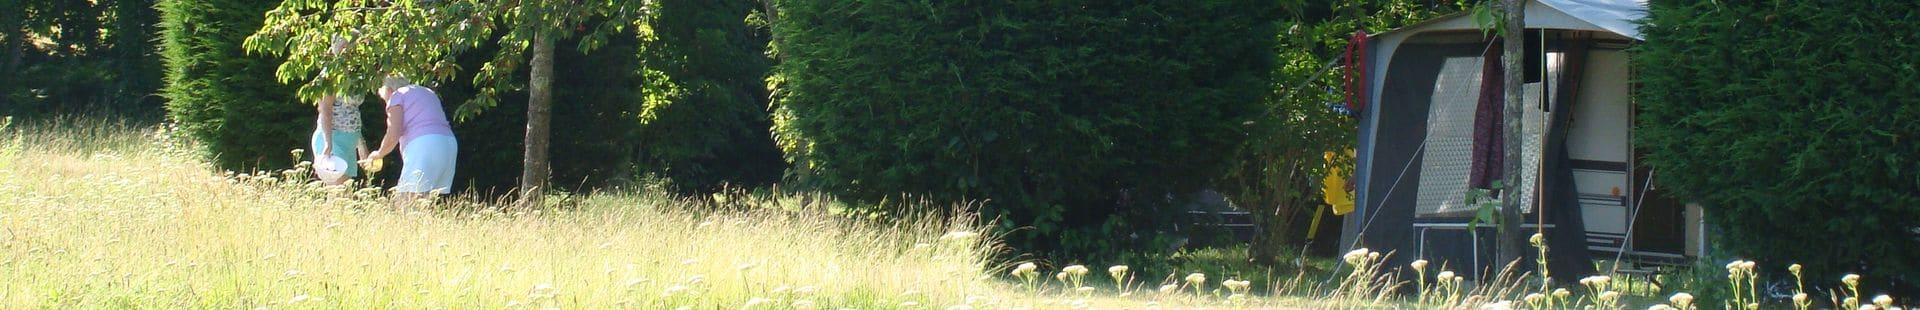 Camping Le Rêve - Kersen plukken